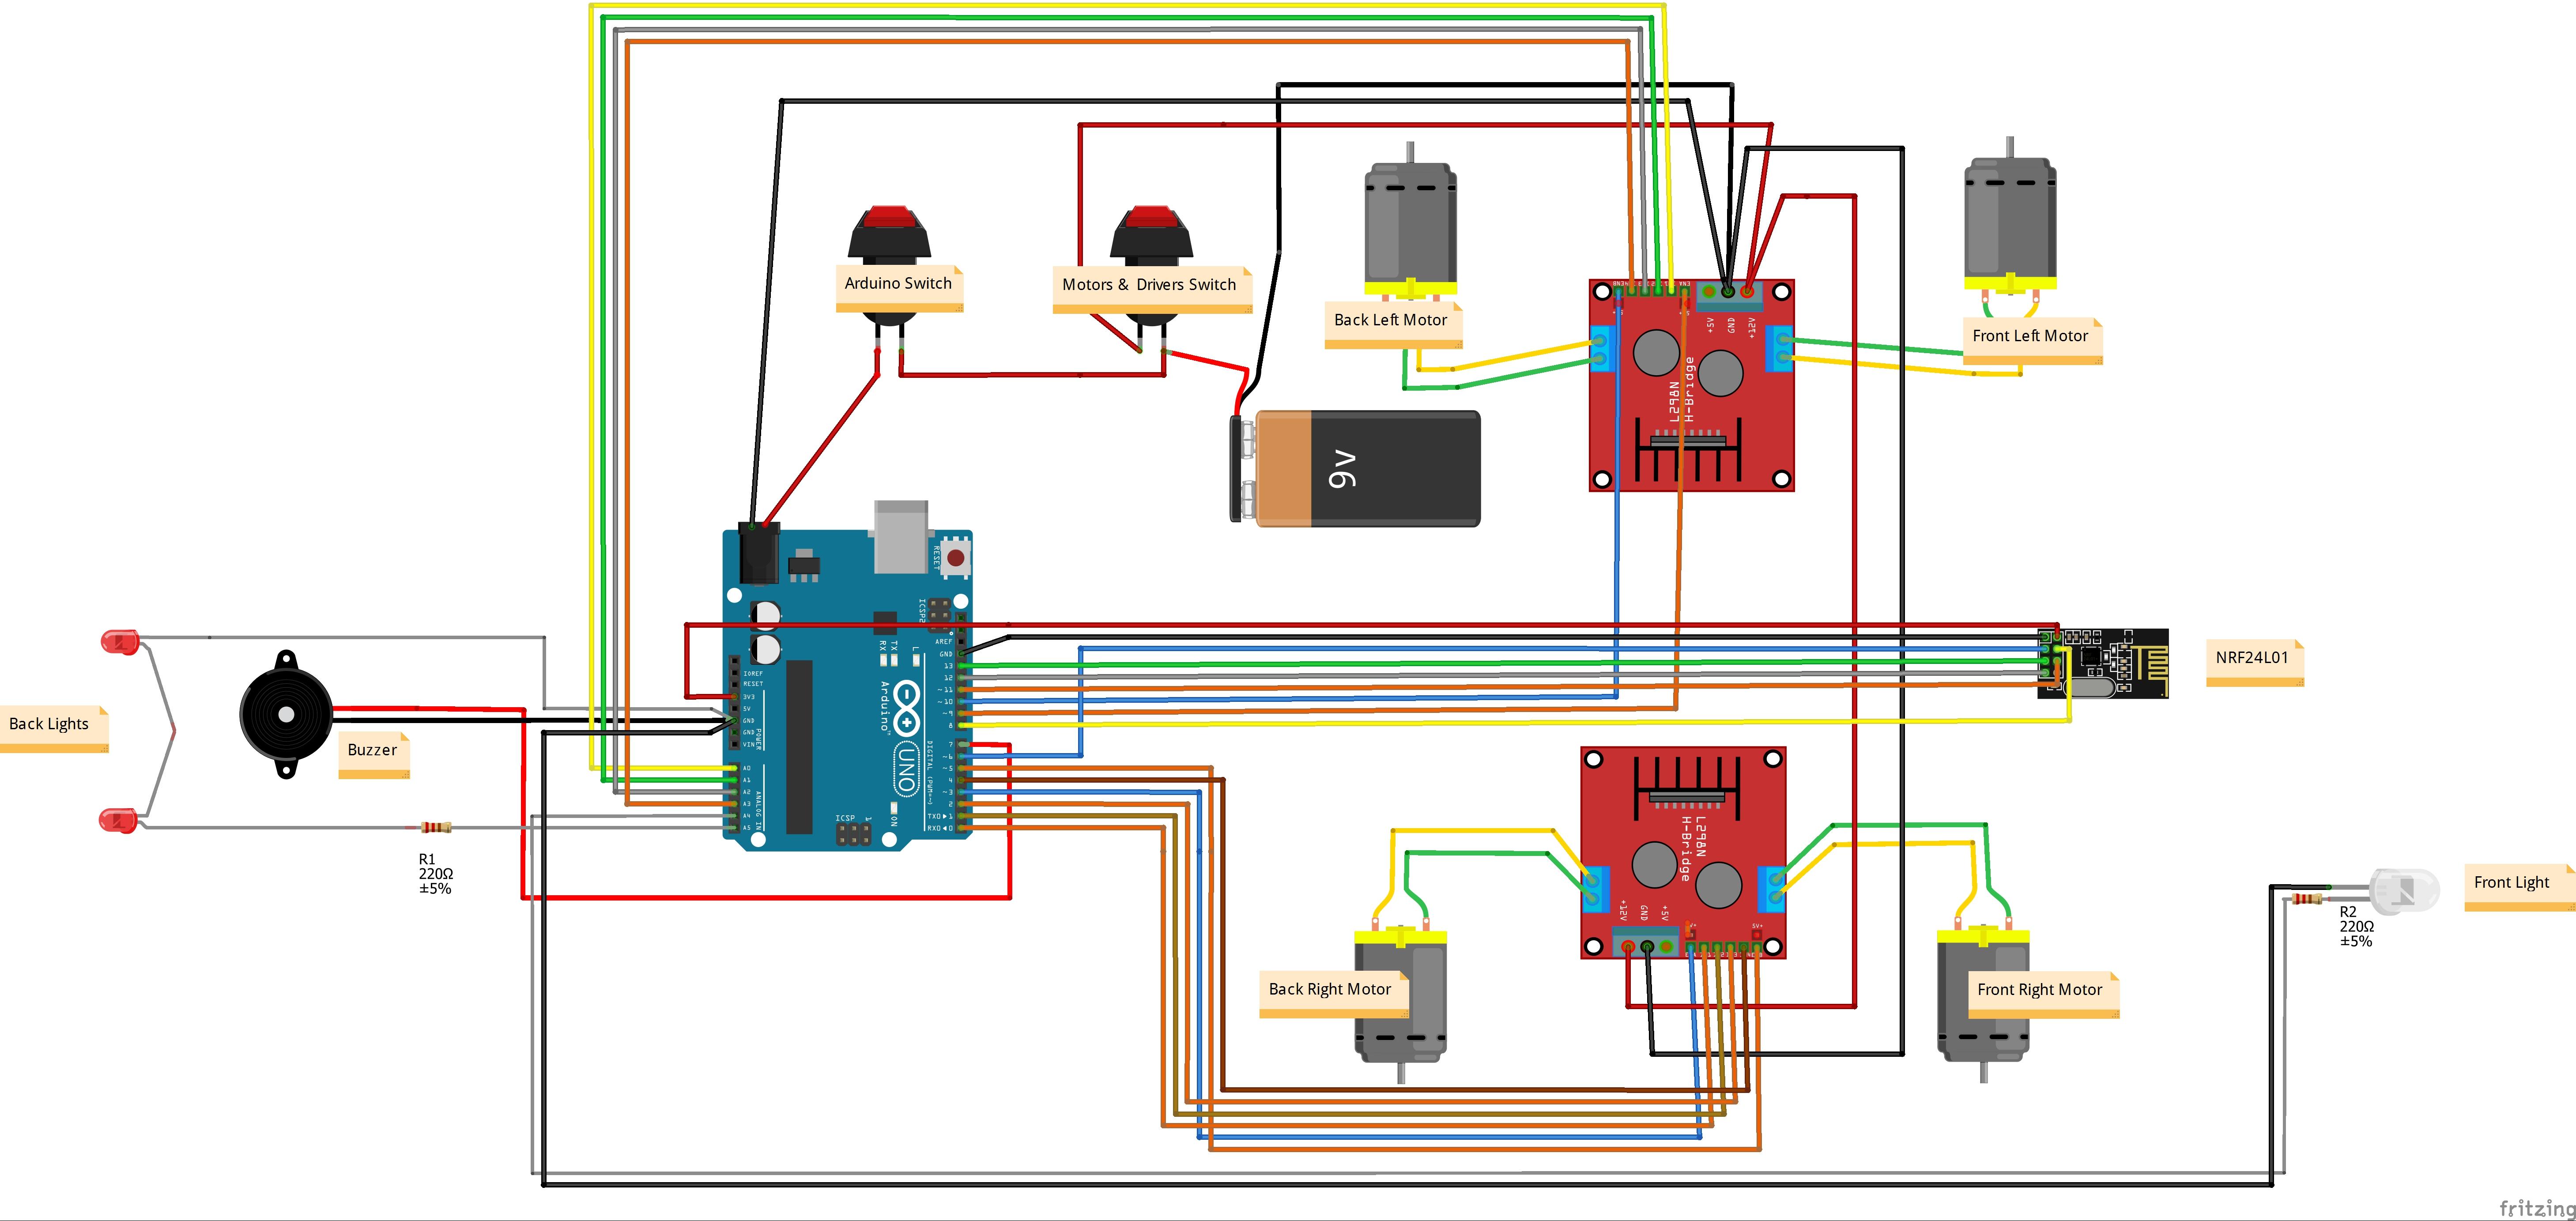 rc car headlight wiring diagram wiring diagram homerc car wiring schematic electrical wiring diagram rc car [ 5835 x 2766 Pixel ]